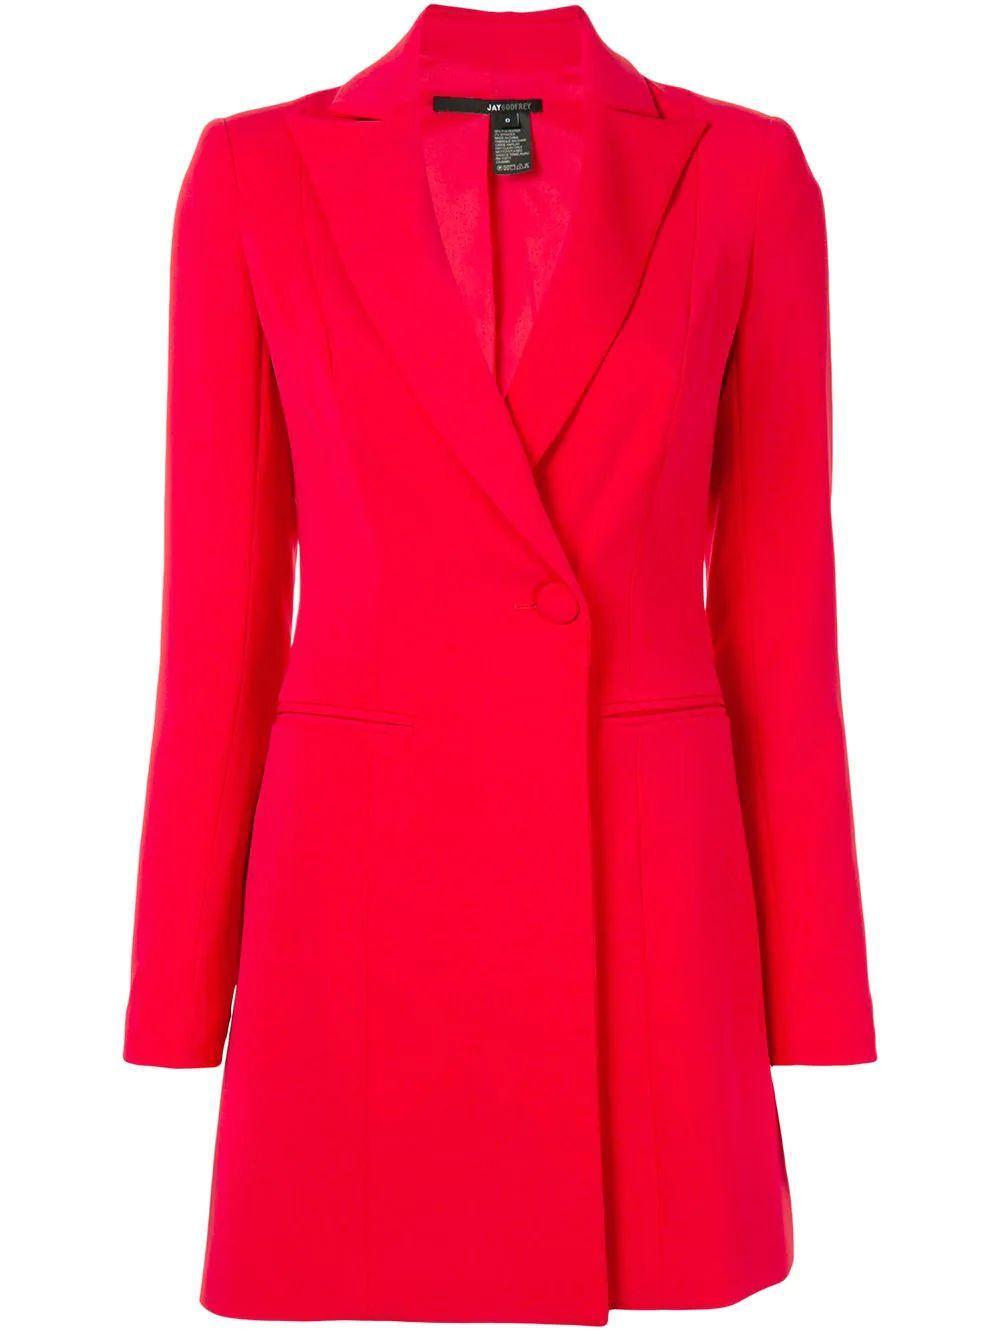 Ace Long Sleeve Blazer Cocktail Dress Item # 112314-F20